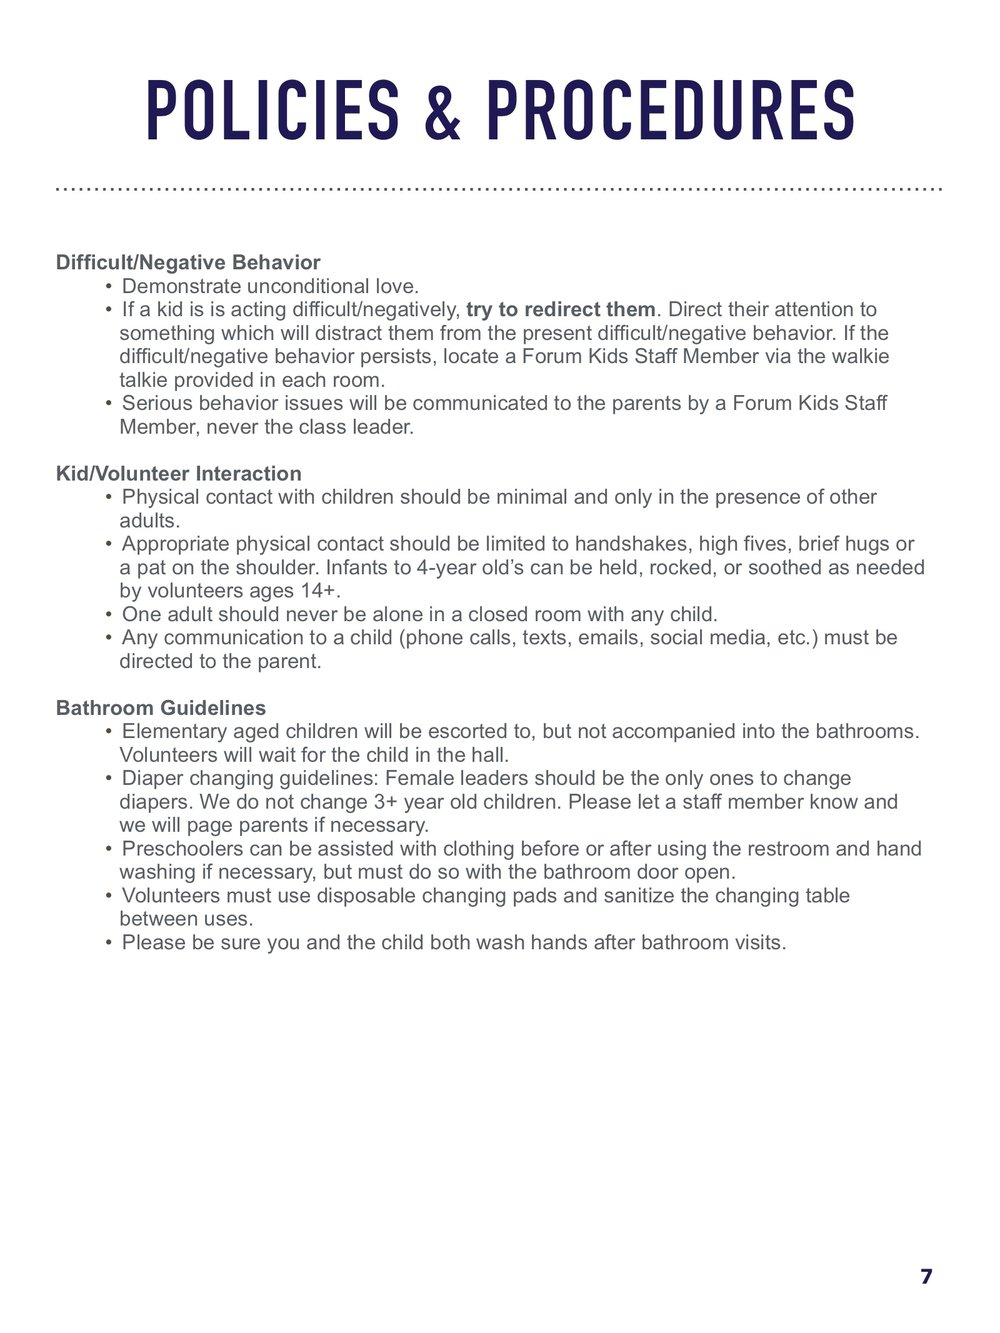 Forum Kids Policy Manual 7.jpg